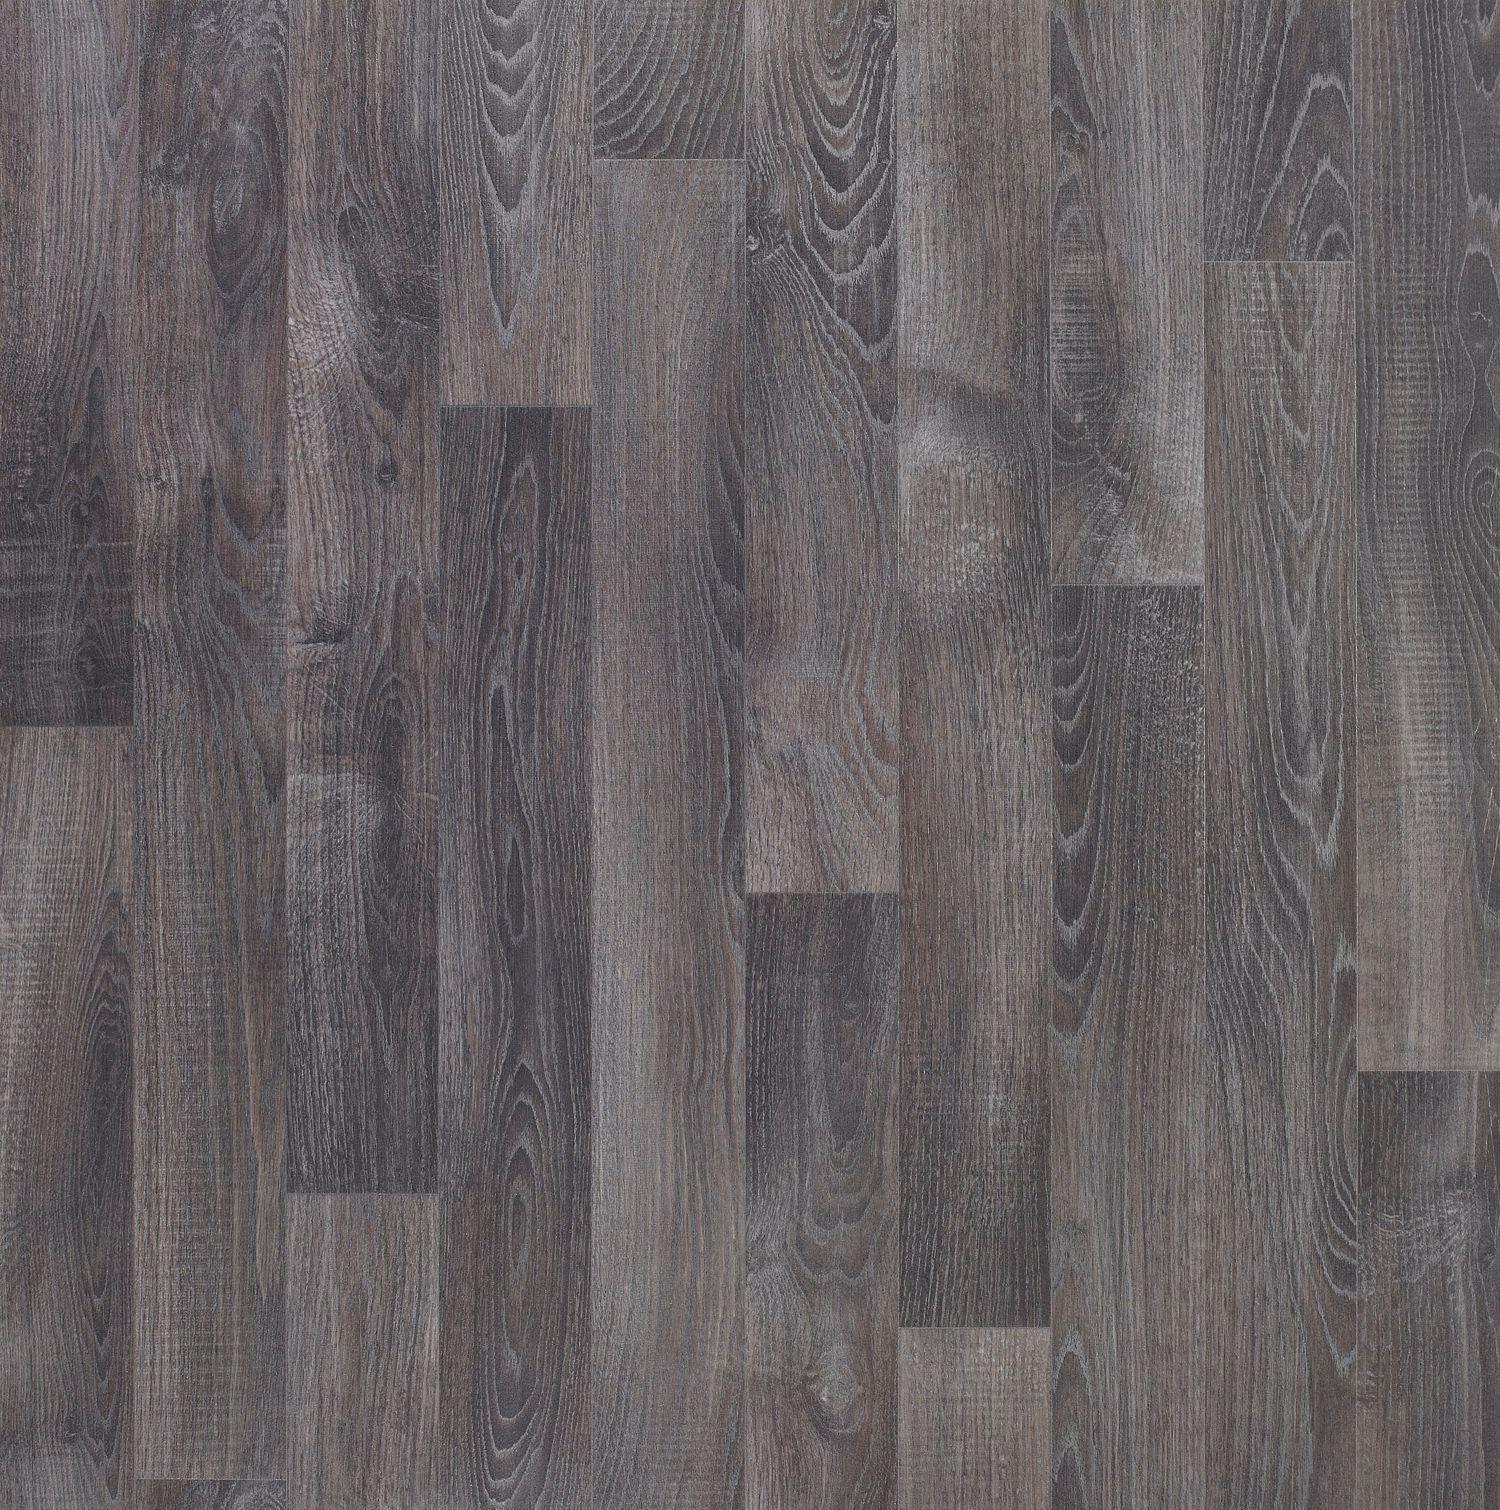 Dark Grey Oak Effect Vinyl Flooring 4 M2